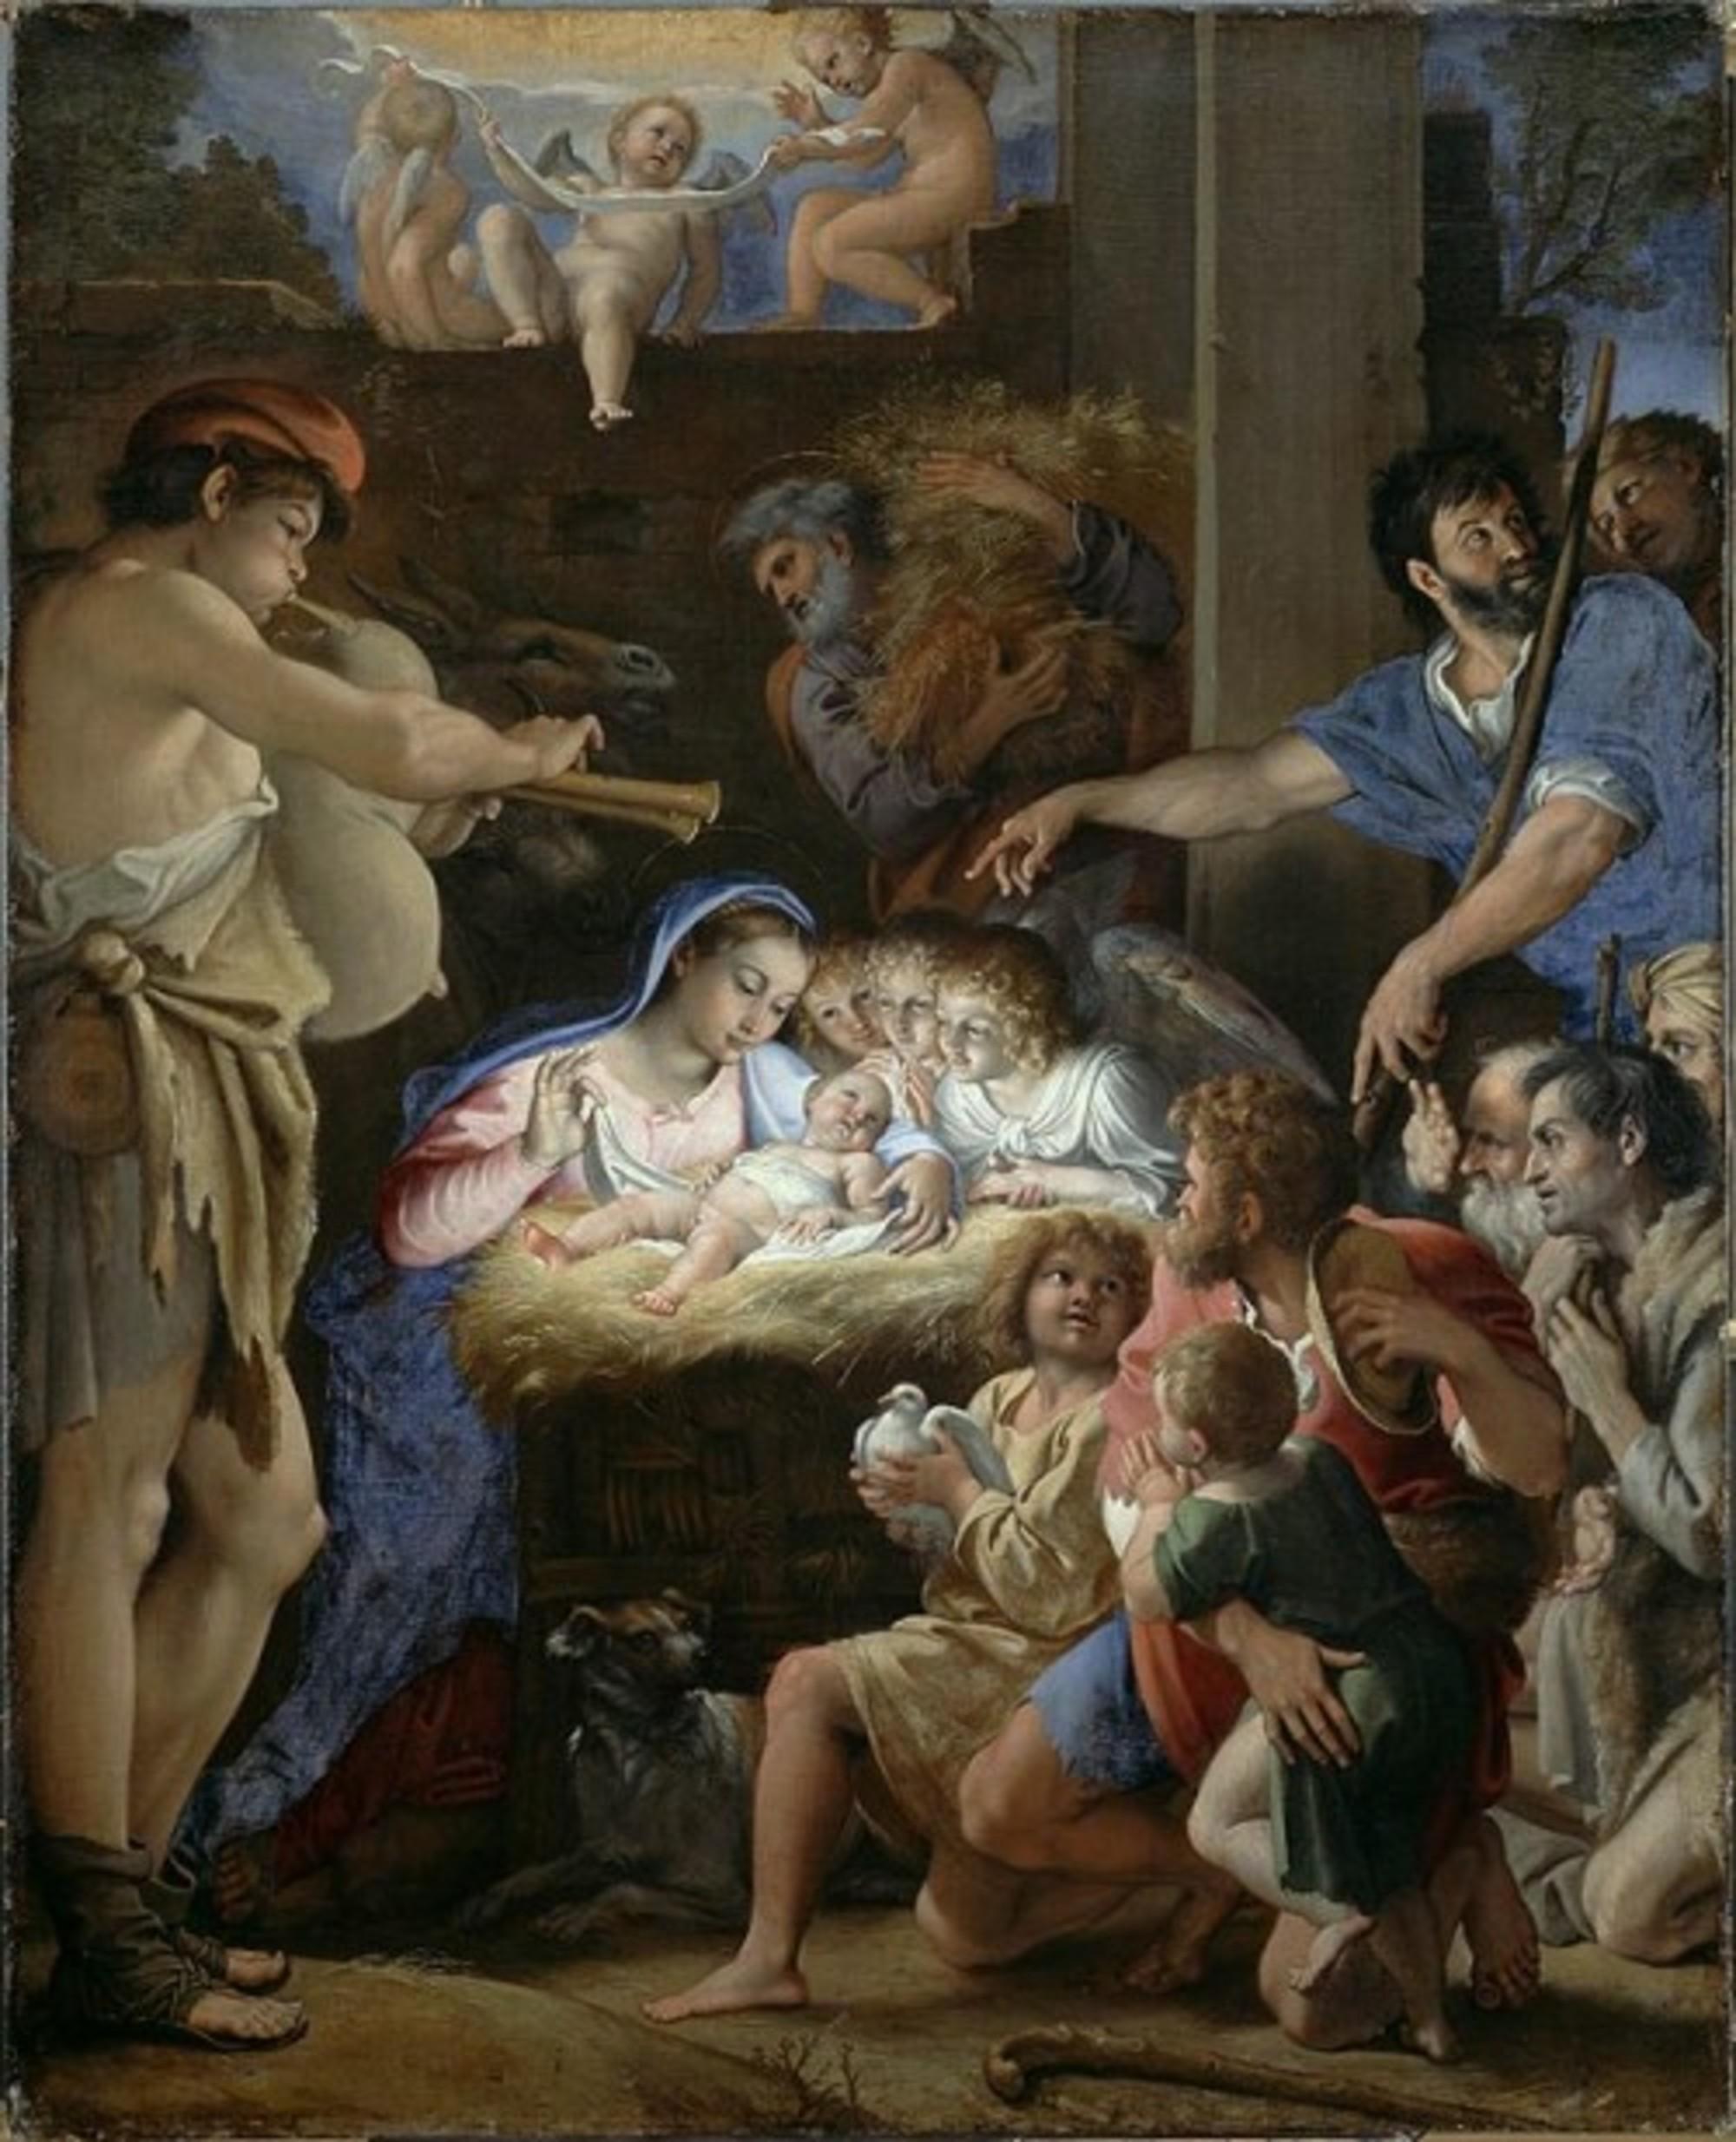 Domenichino-Domenico-Zampieri-The-Adoration-of-the-Shepherds-c.-1607-10-Oil-on-canvas-143-x-115cm-National-Gallery-of-Scotland.jpg